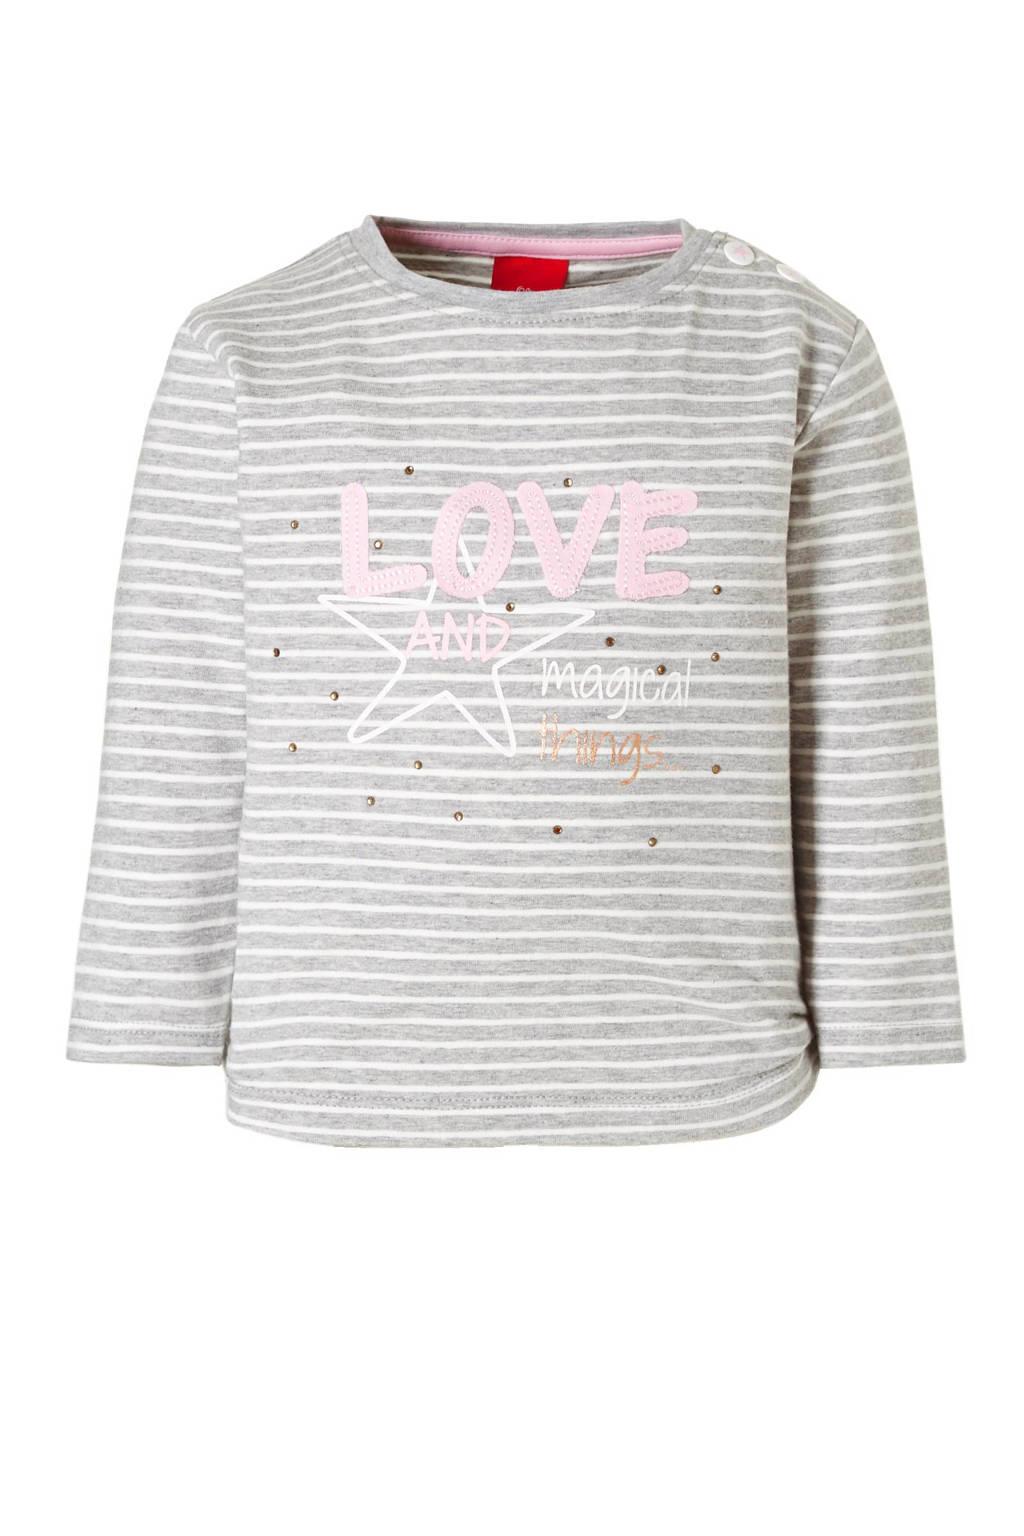 s.Oliver T-shirt, Grijs